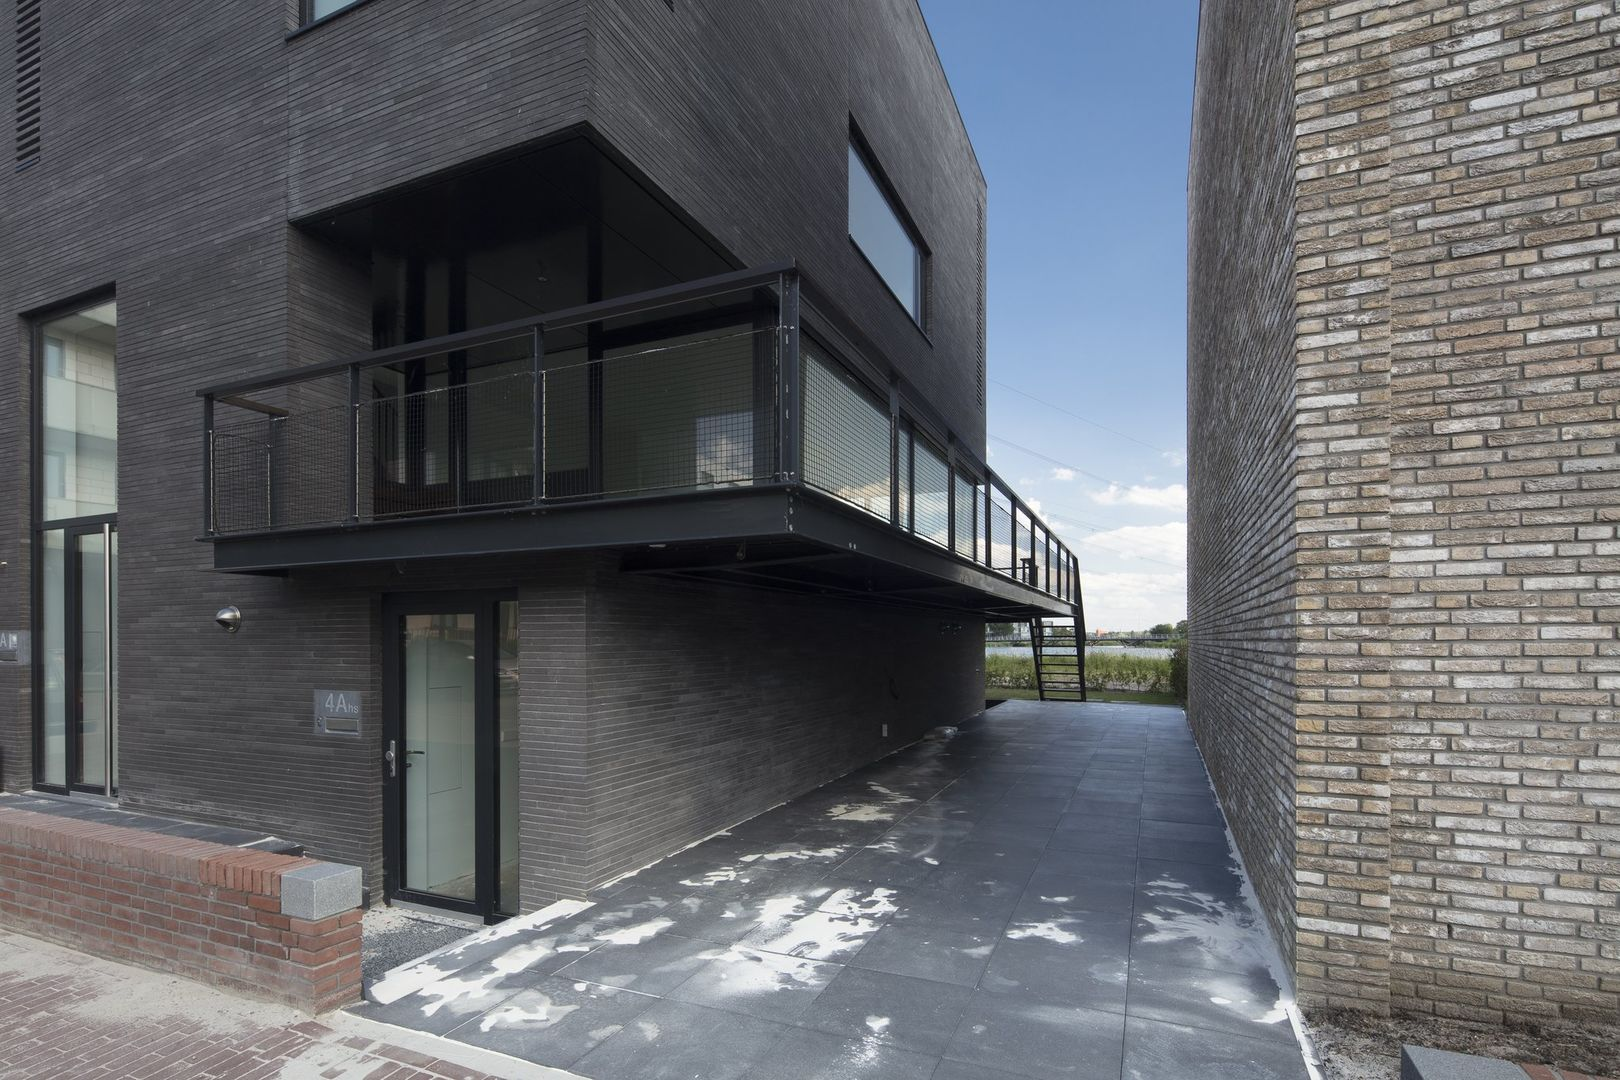 Edward Wrightstraat 4 /A, Amsterdam foto-